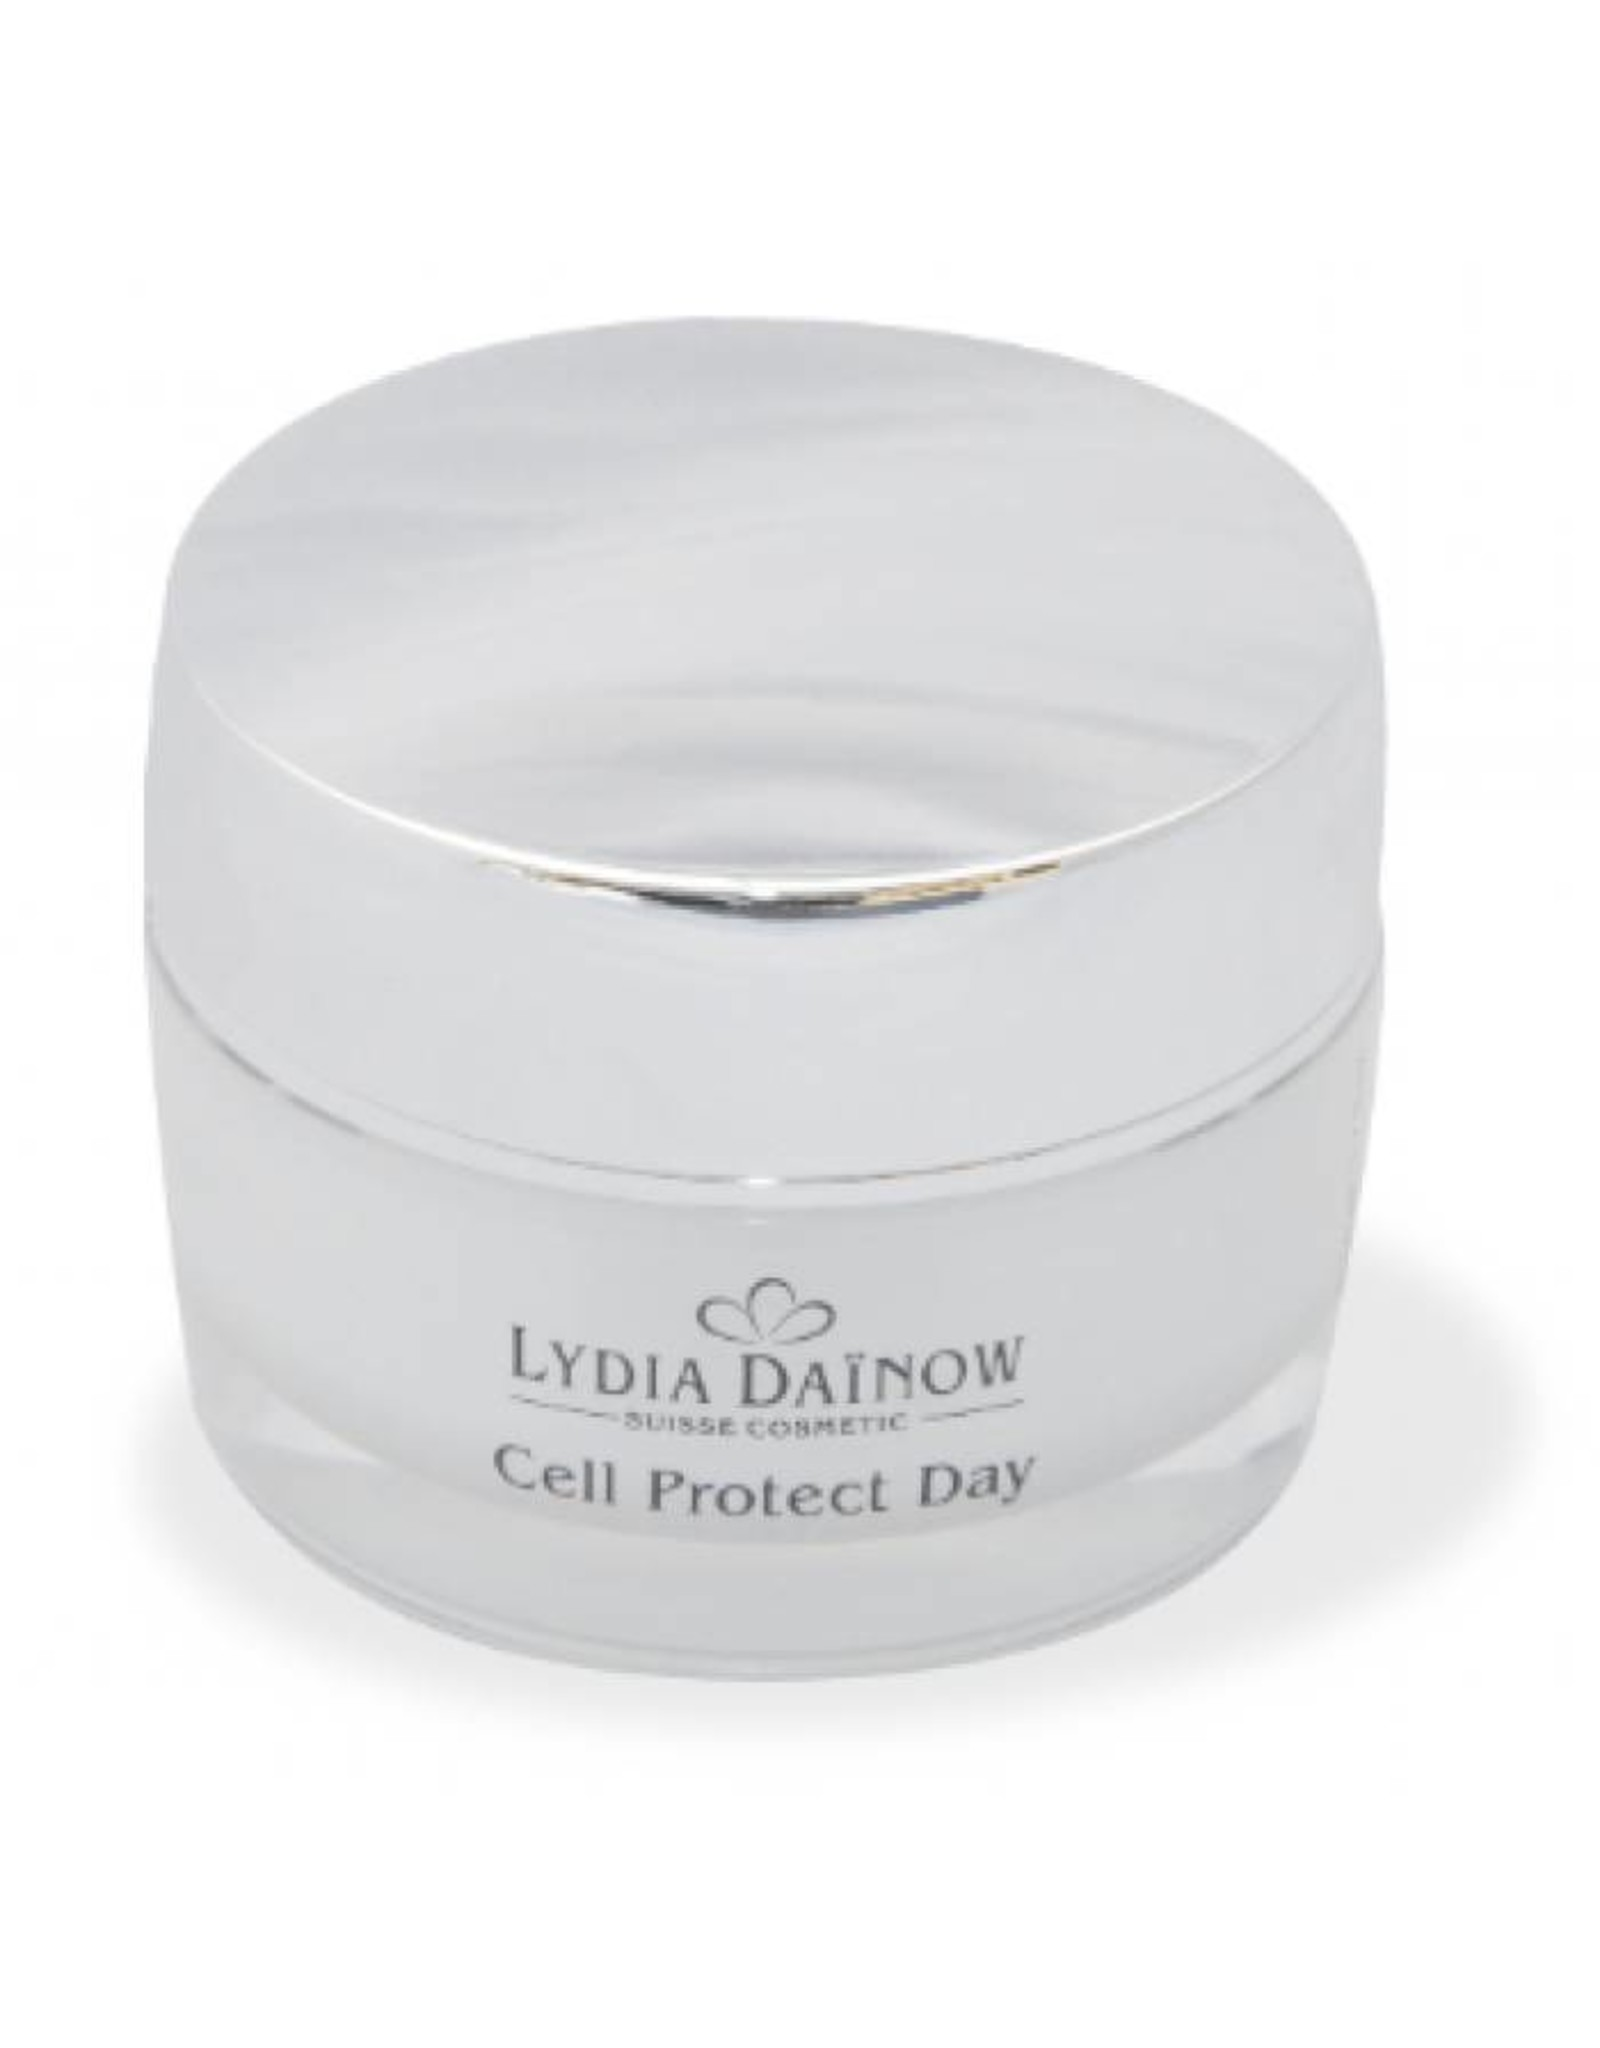 Lydïa Dainow Cell Protect Day - Pflegecreme mit Zellschutz